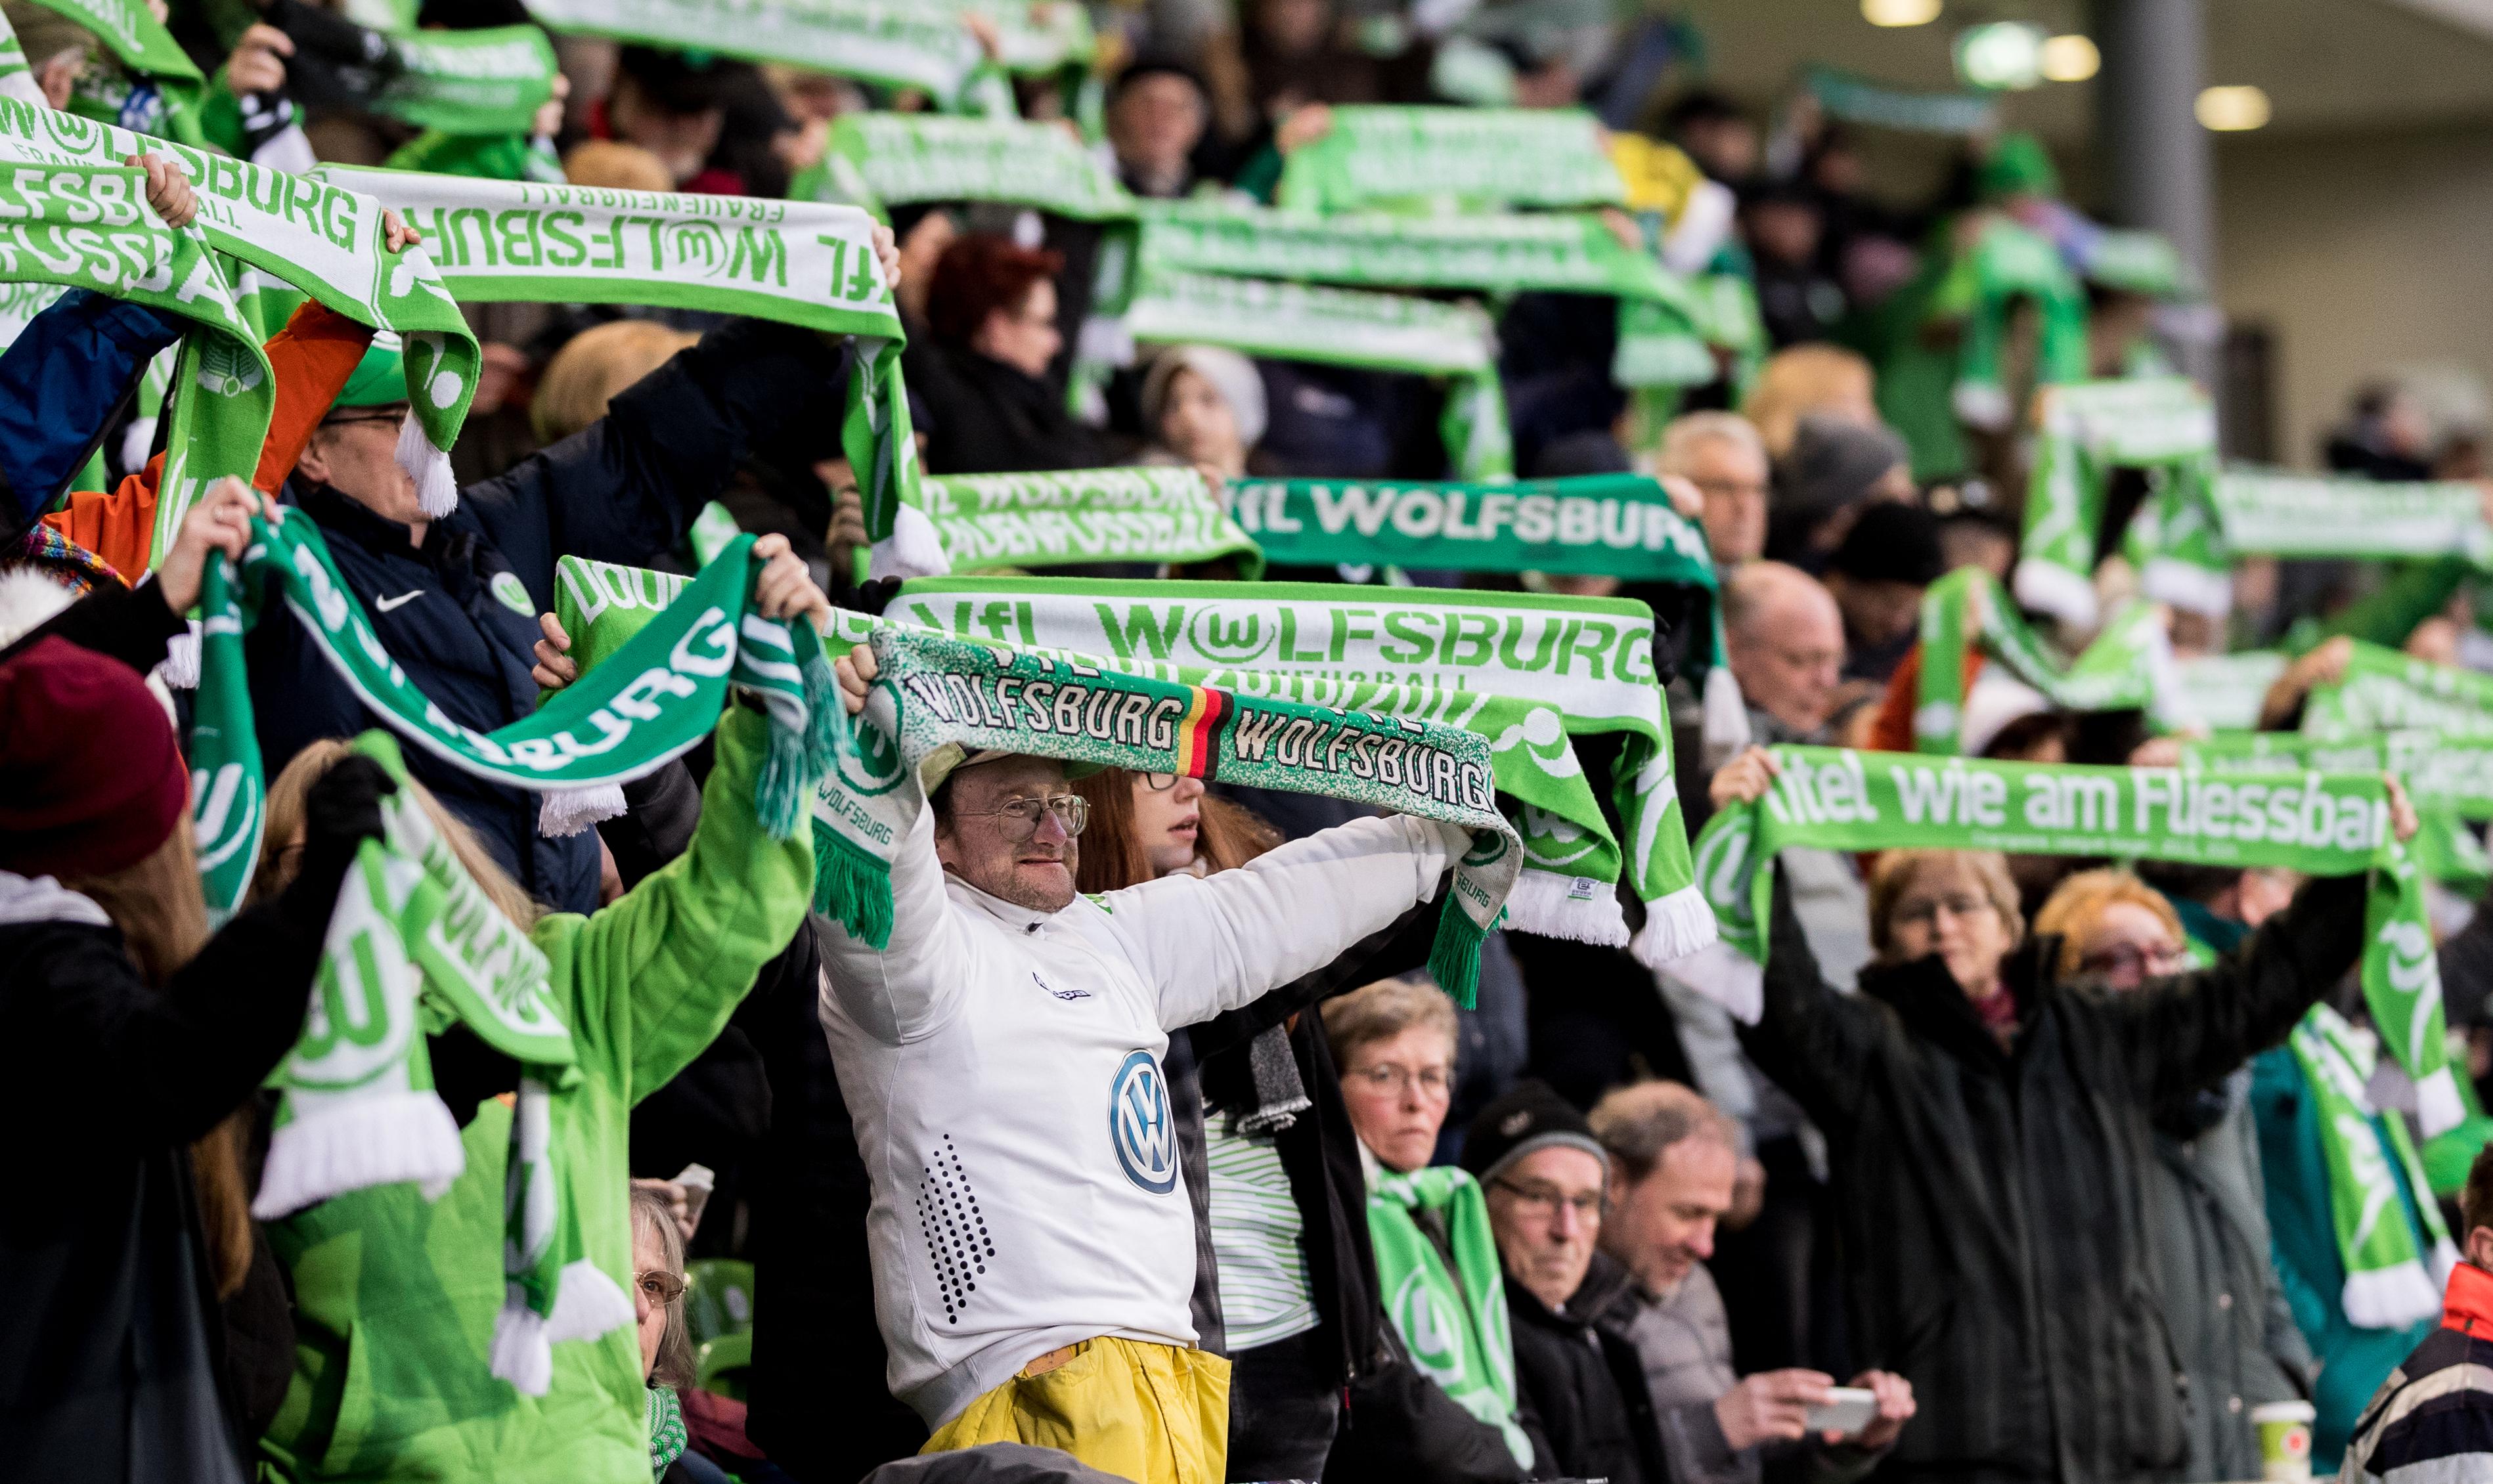 Wolfsburg v Slavia Praha - UEFA Champions League Quarter Final